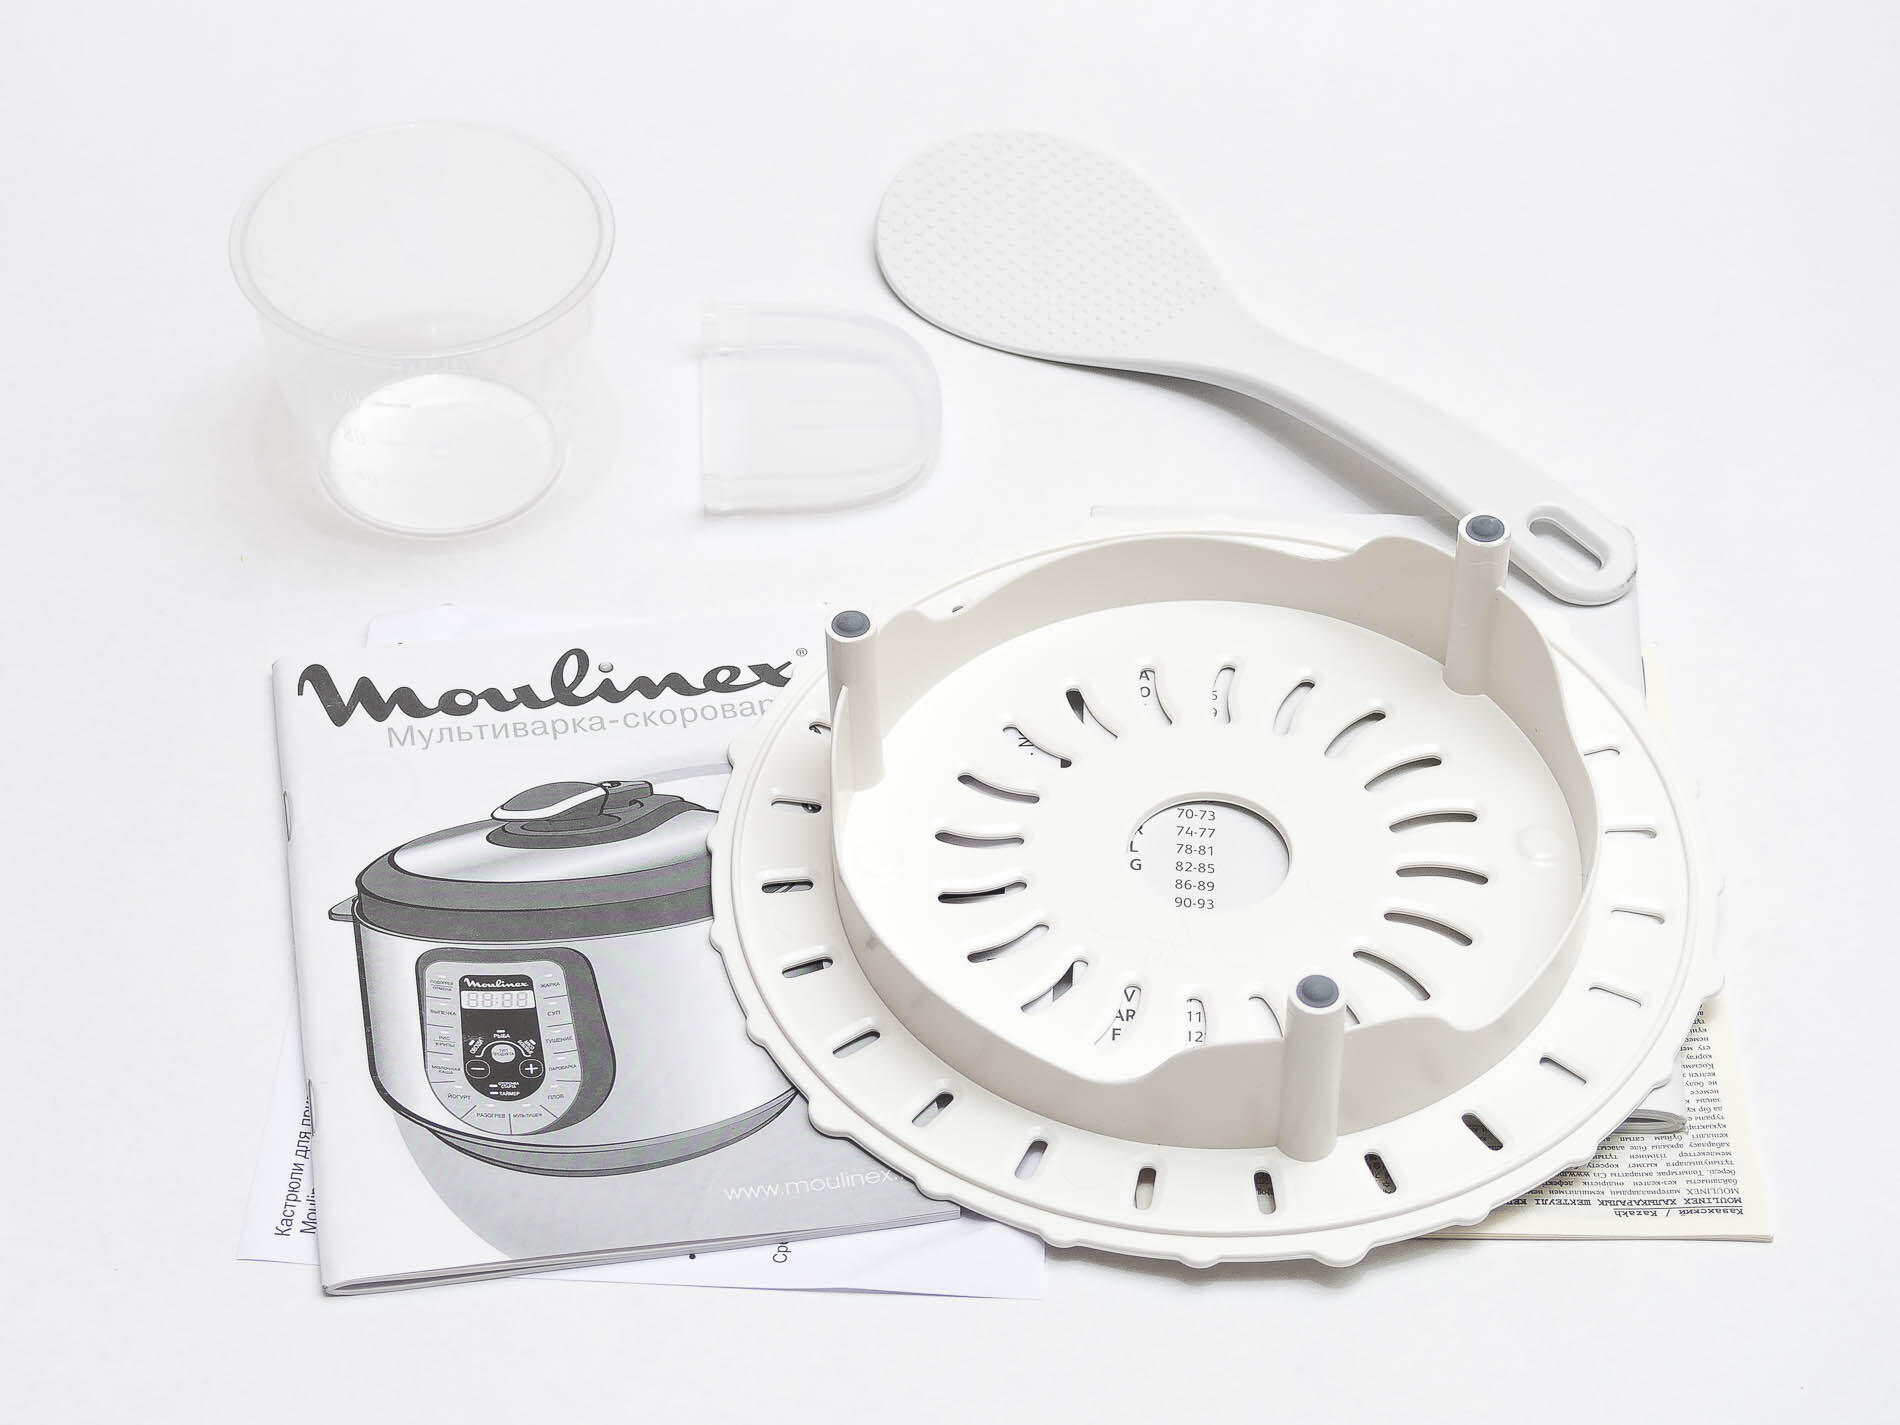 Bytovaya Tehnika - Obzor multivarki-skorovarki Moulinex CE500E32